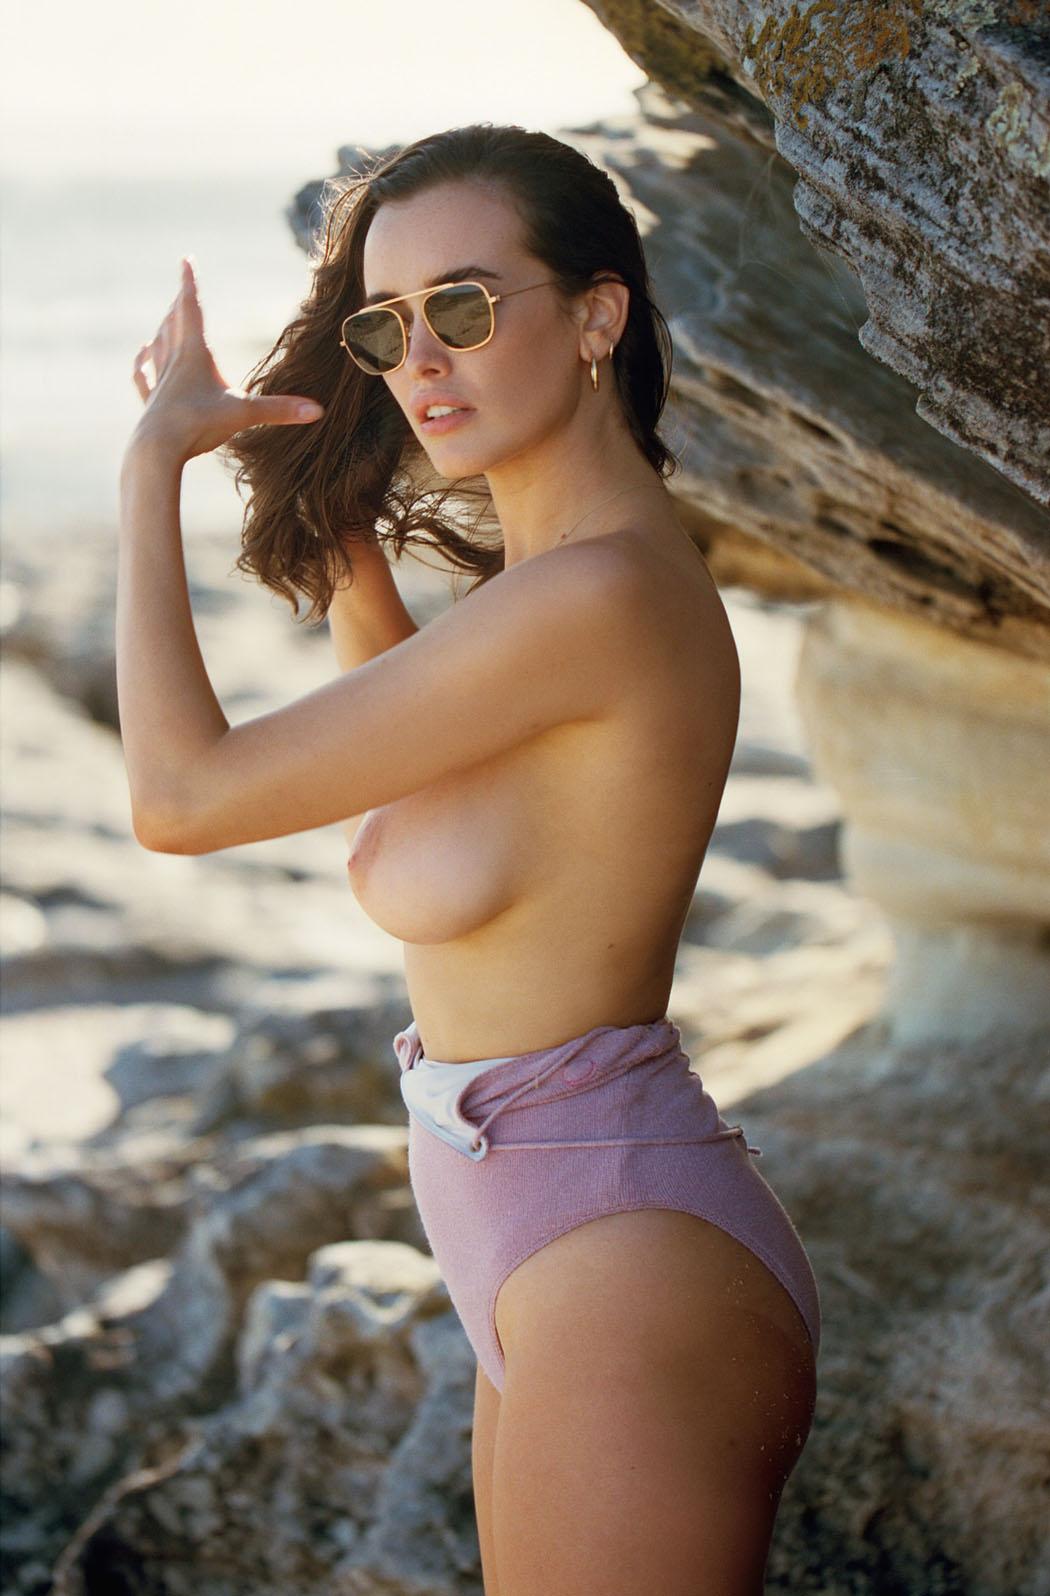 sarah-stephens-seaside-erotic-photo-by-cameron-mackie-11